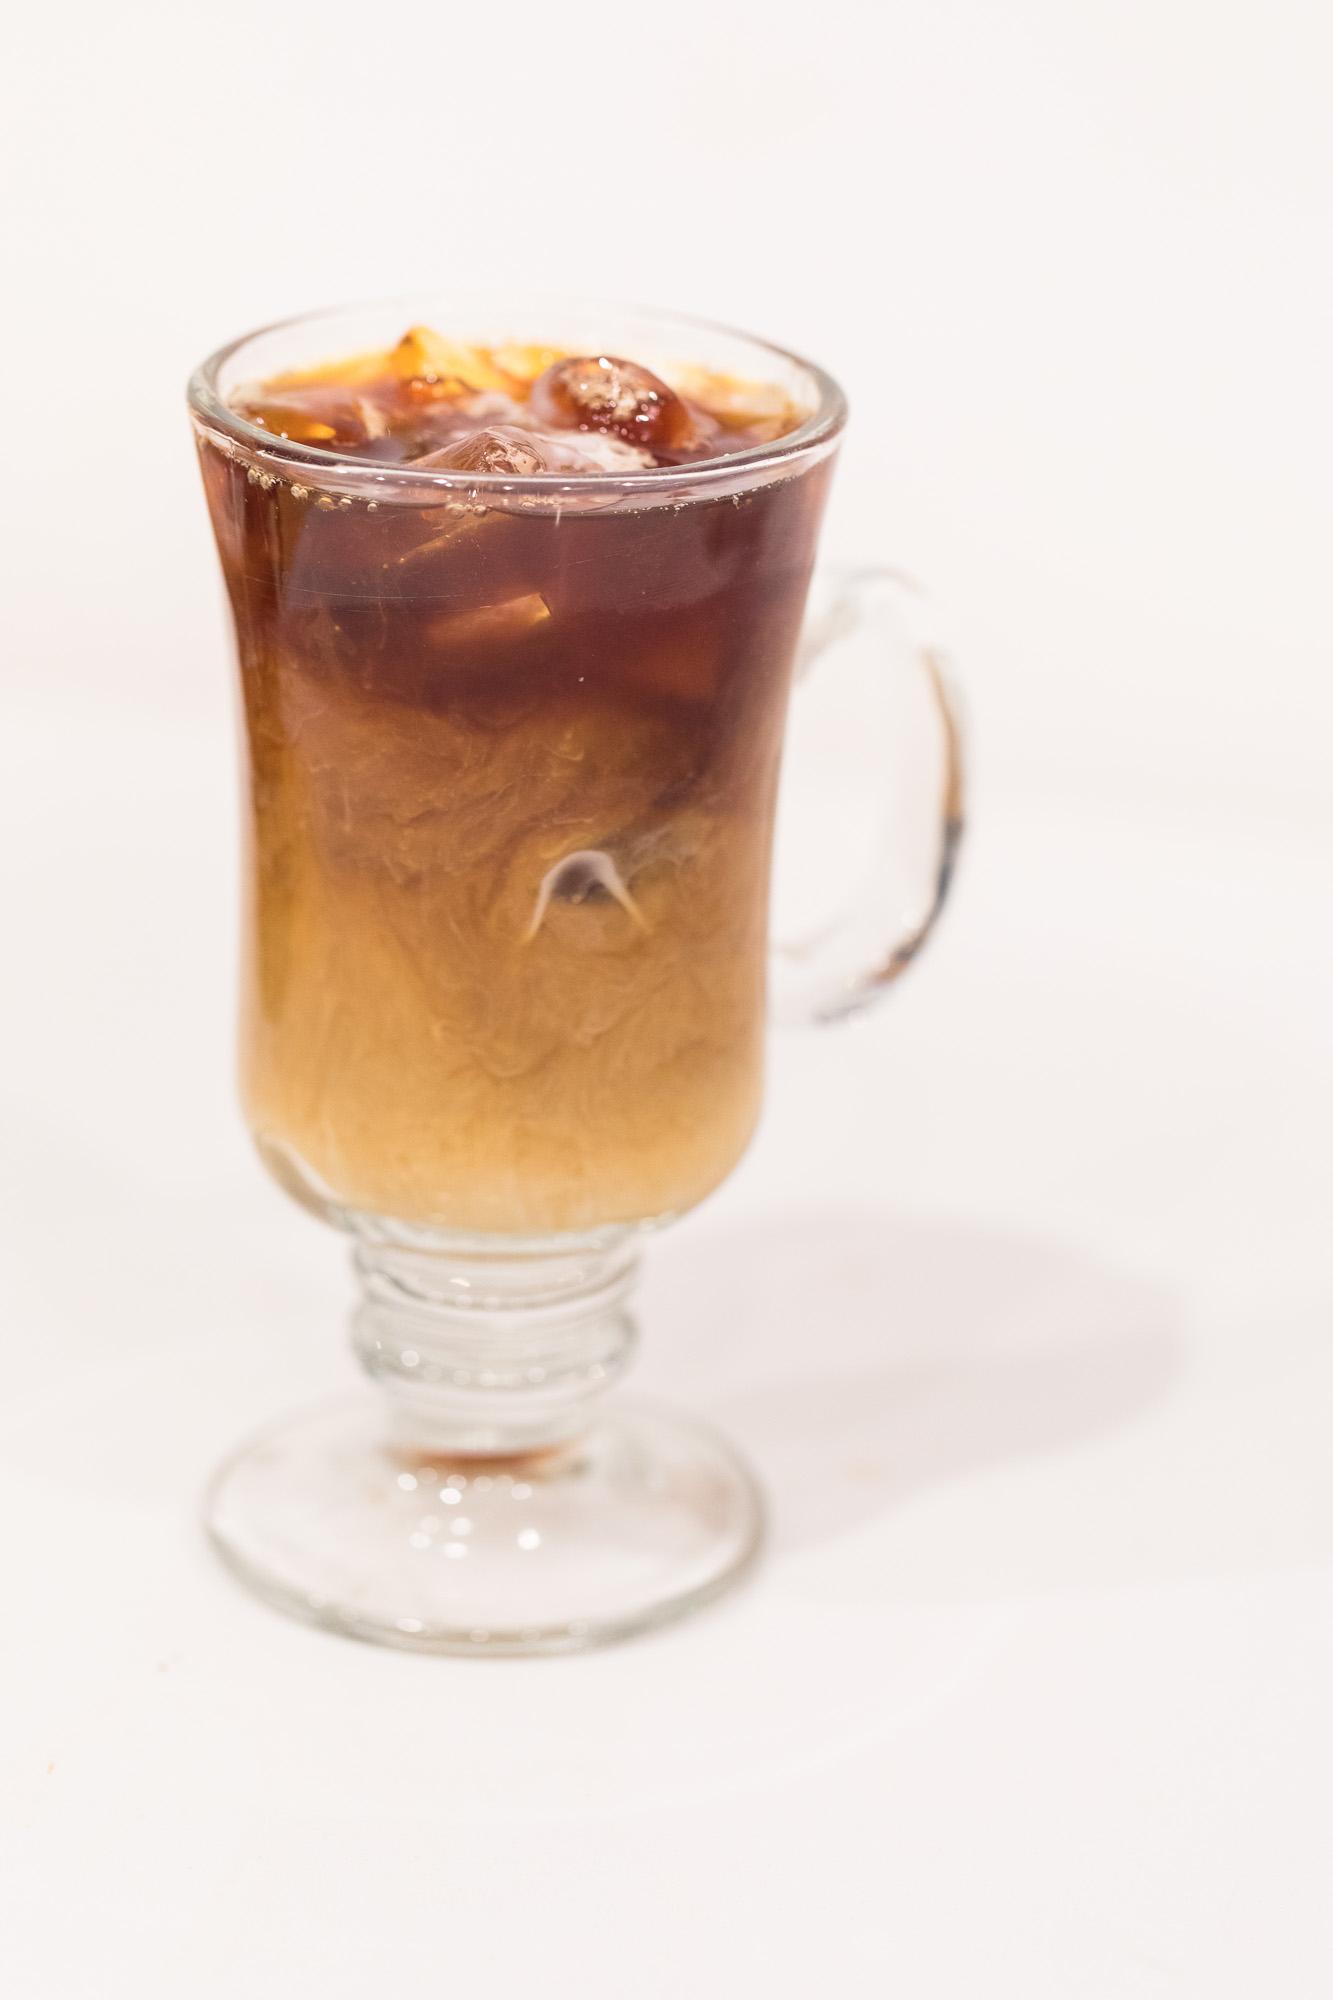 Maka-vegan-gluten-free-maui-cafe-coffee-2 copy.jpg